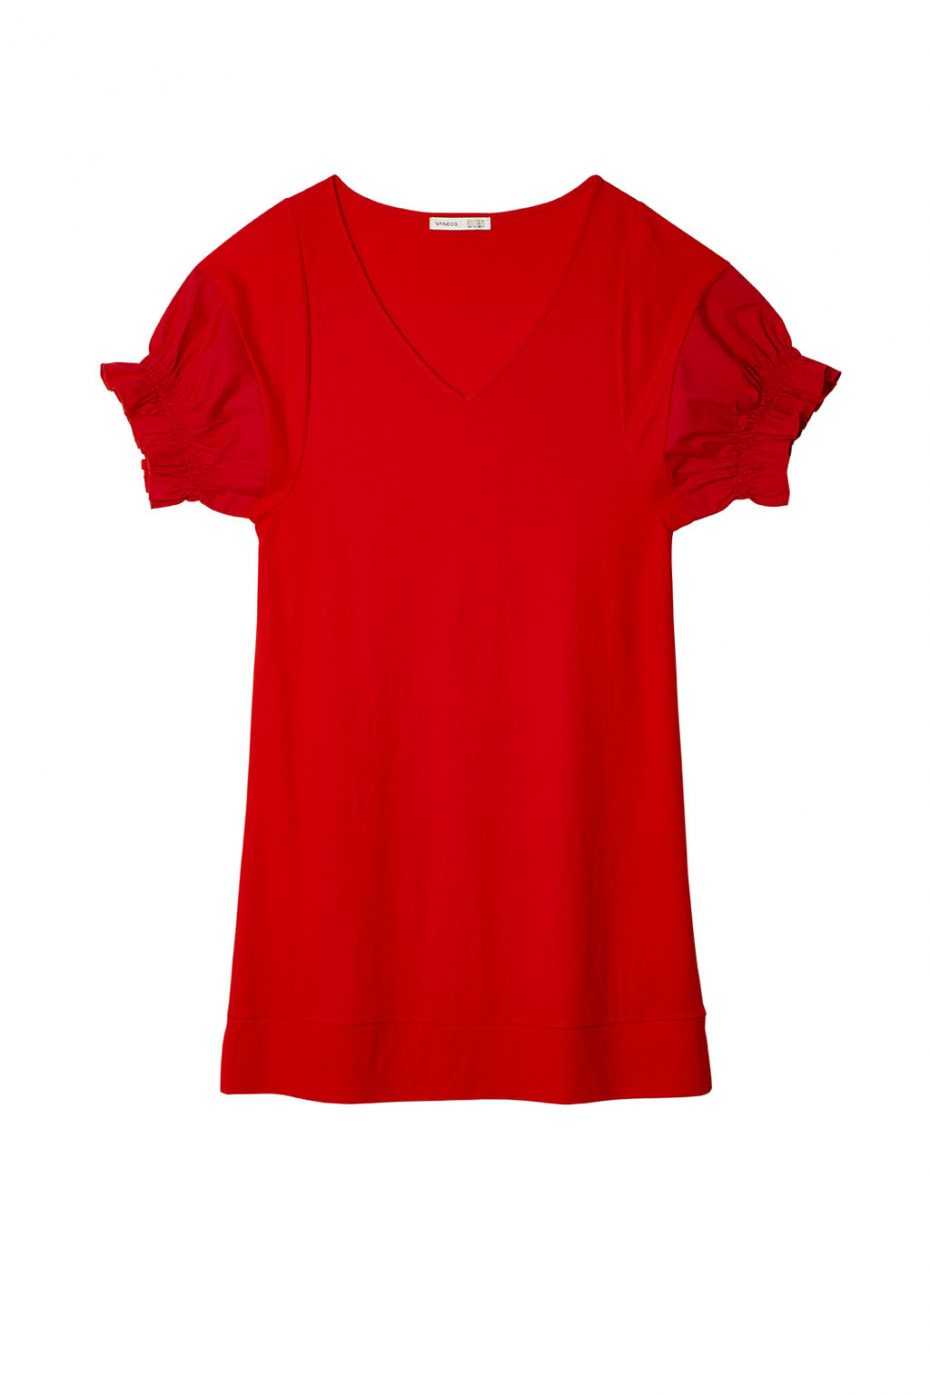 Vestido Corto Mangas Abullonadas Rojo de Vandos